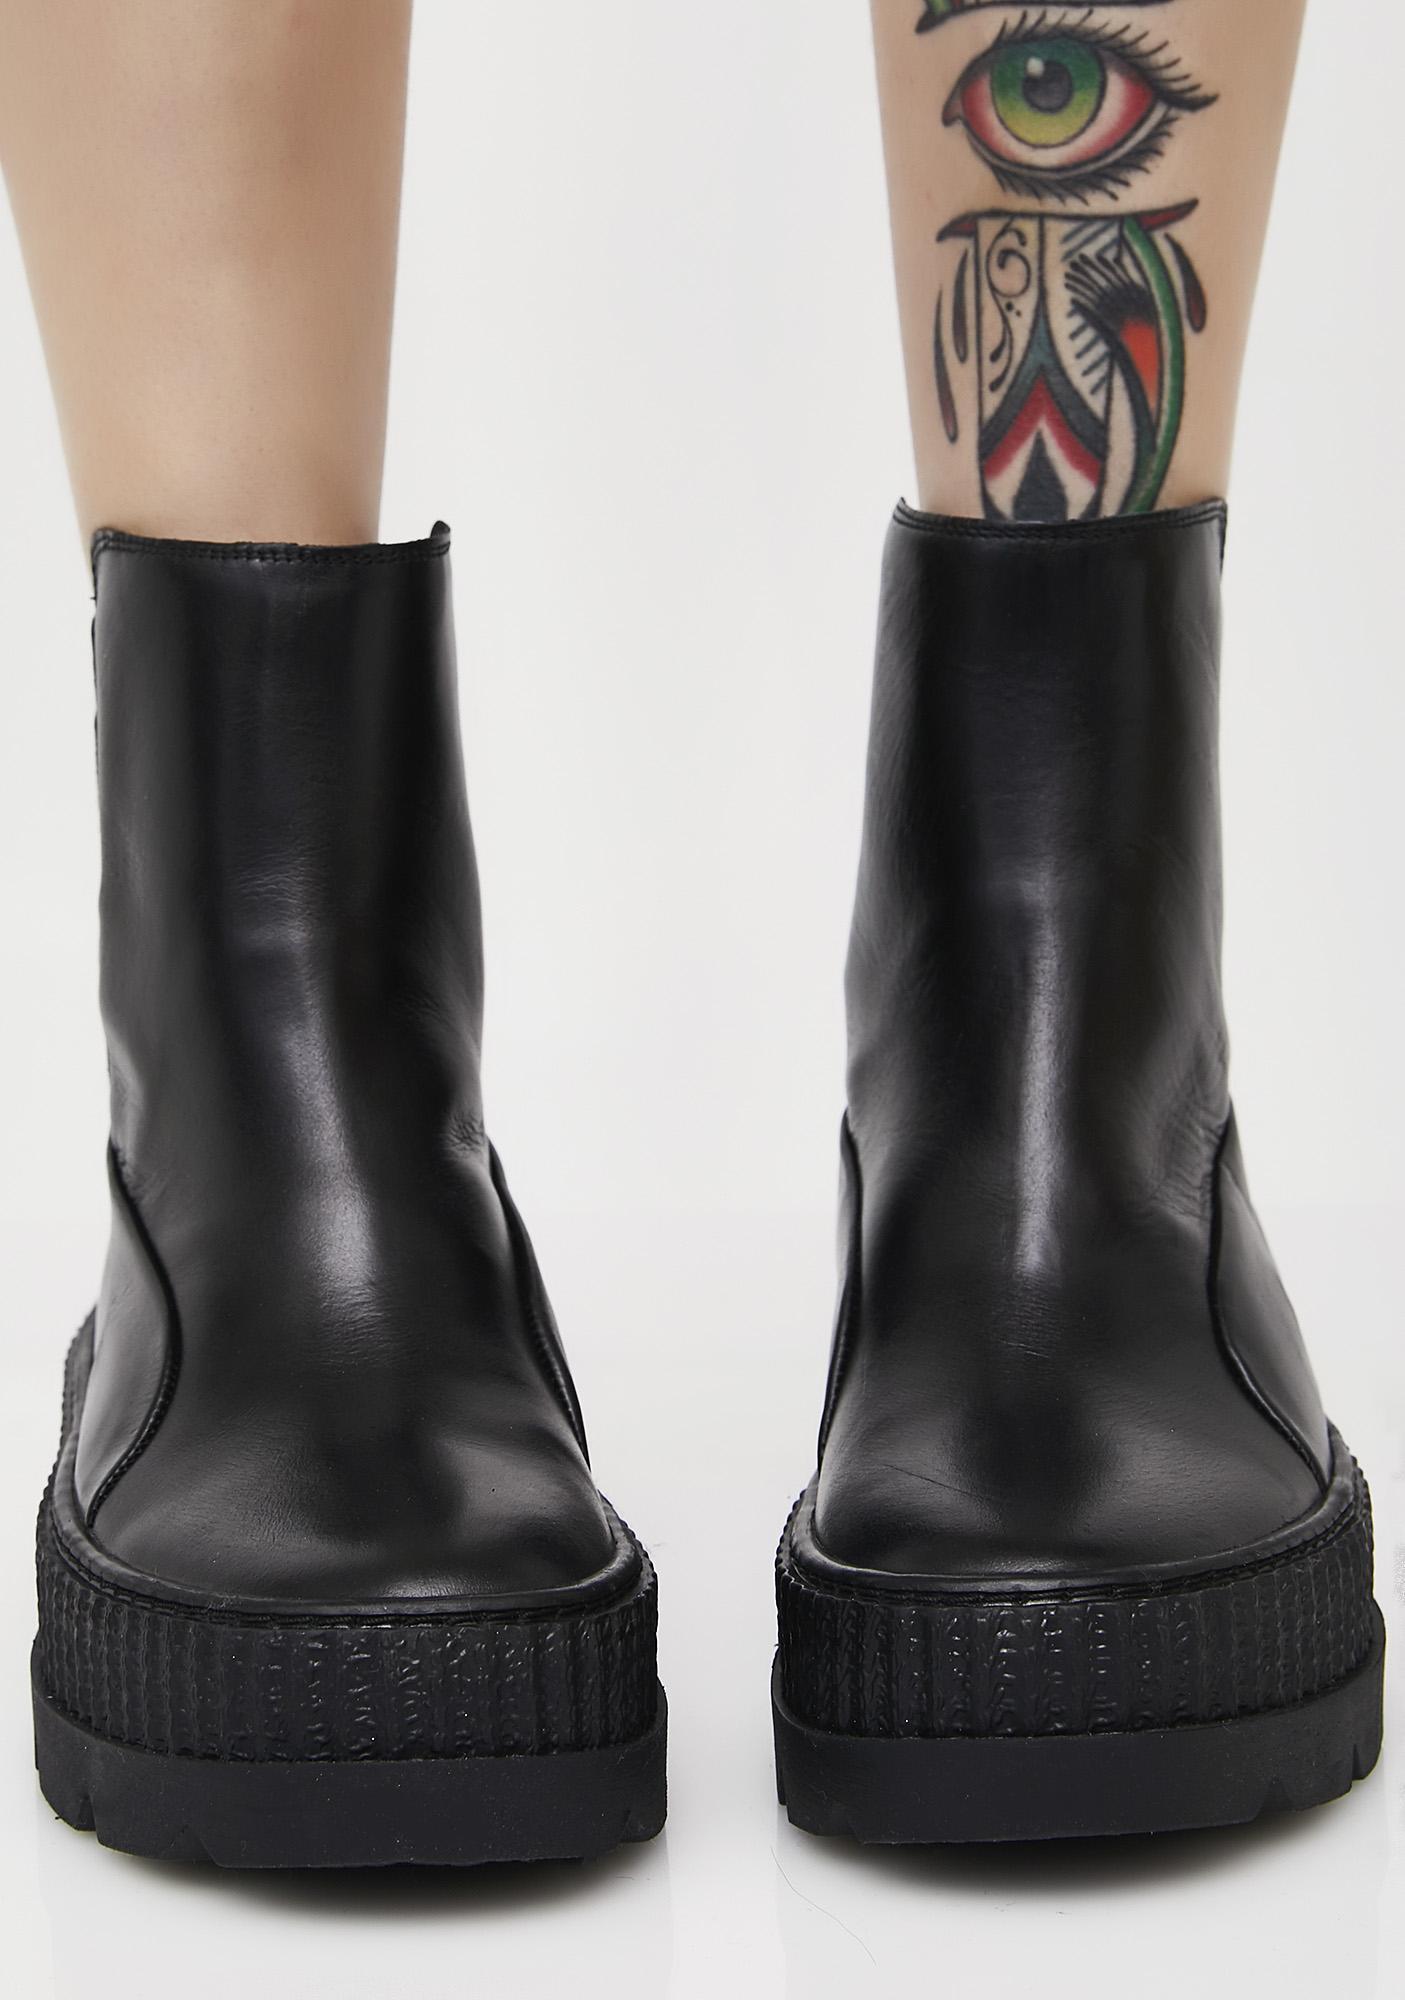 ... PUMA FENTY PUMA By Rihanna Chelsea Sneaker Boots ... 2c5a740b5